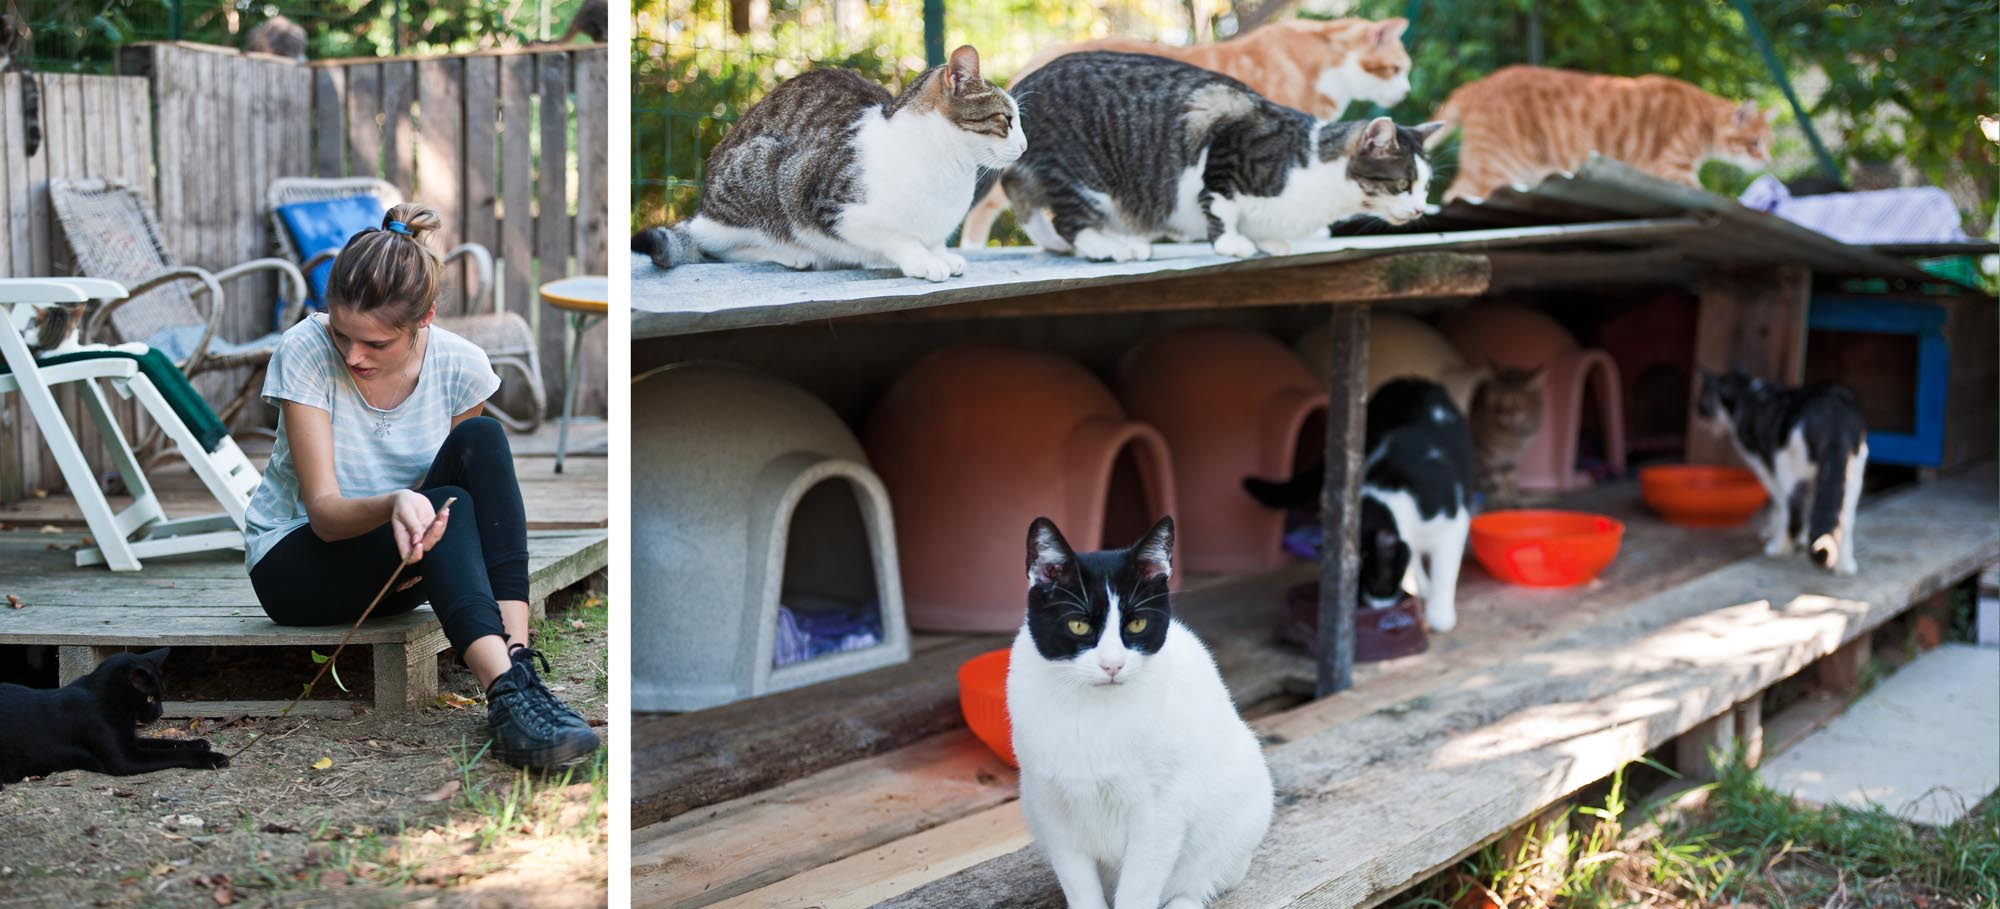 0194 Volontari per gatti randagi - Gattile, legami felini